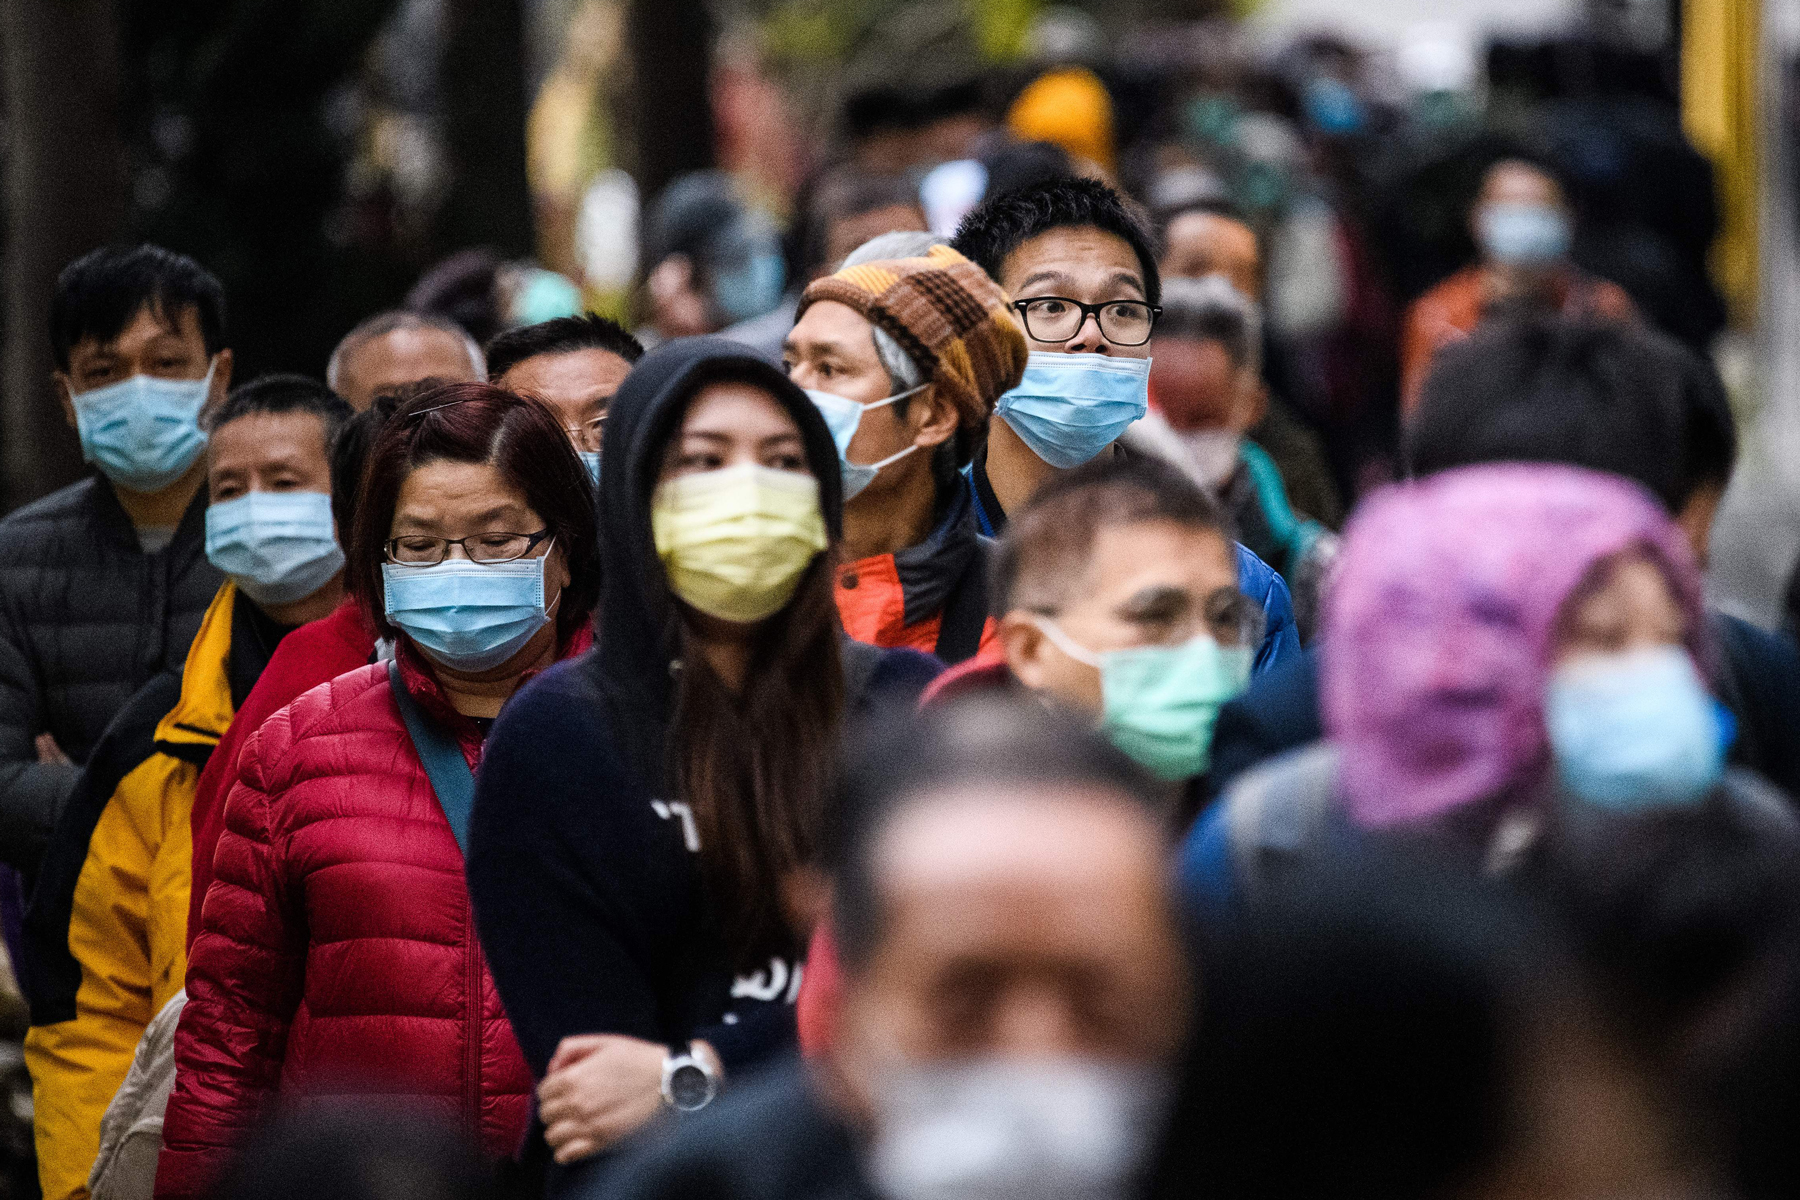 SXSW Notes 'Handful' of Cancellations Amid Coronavirus Scare